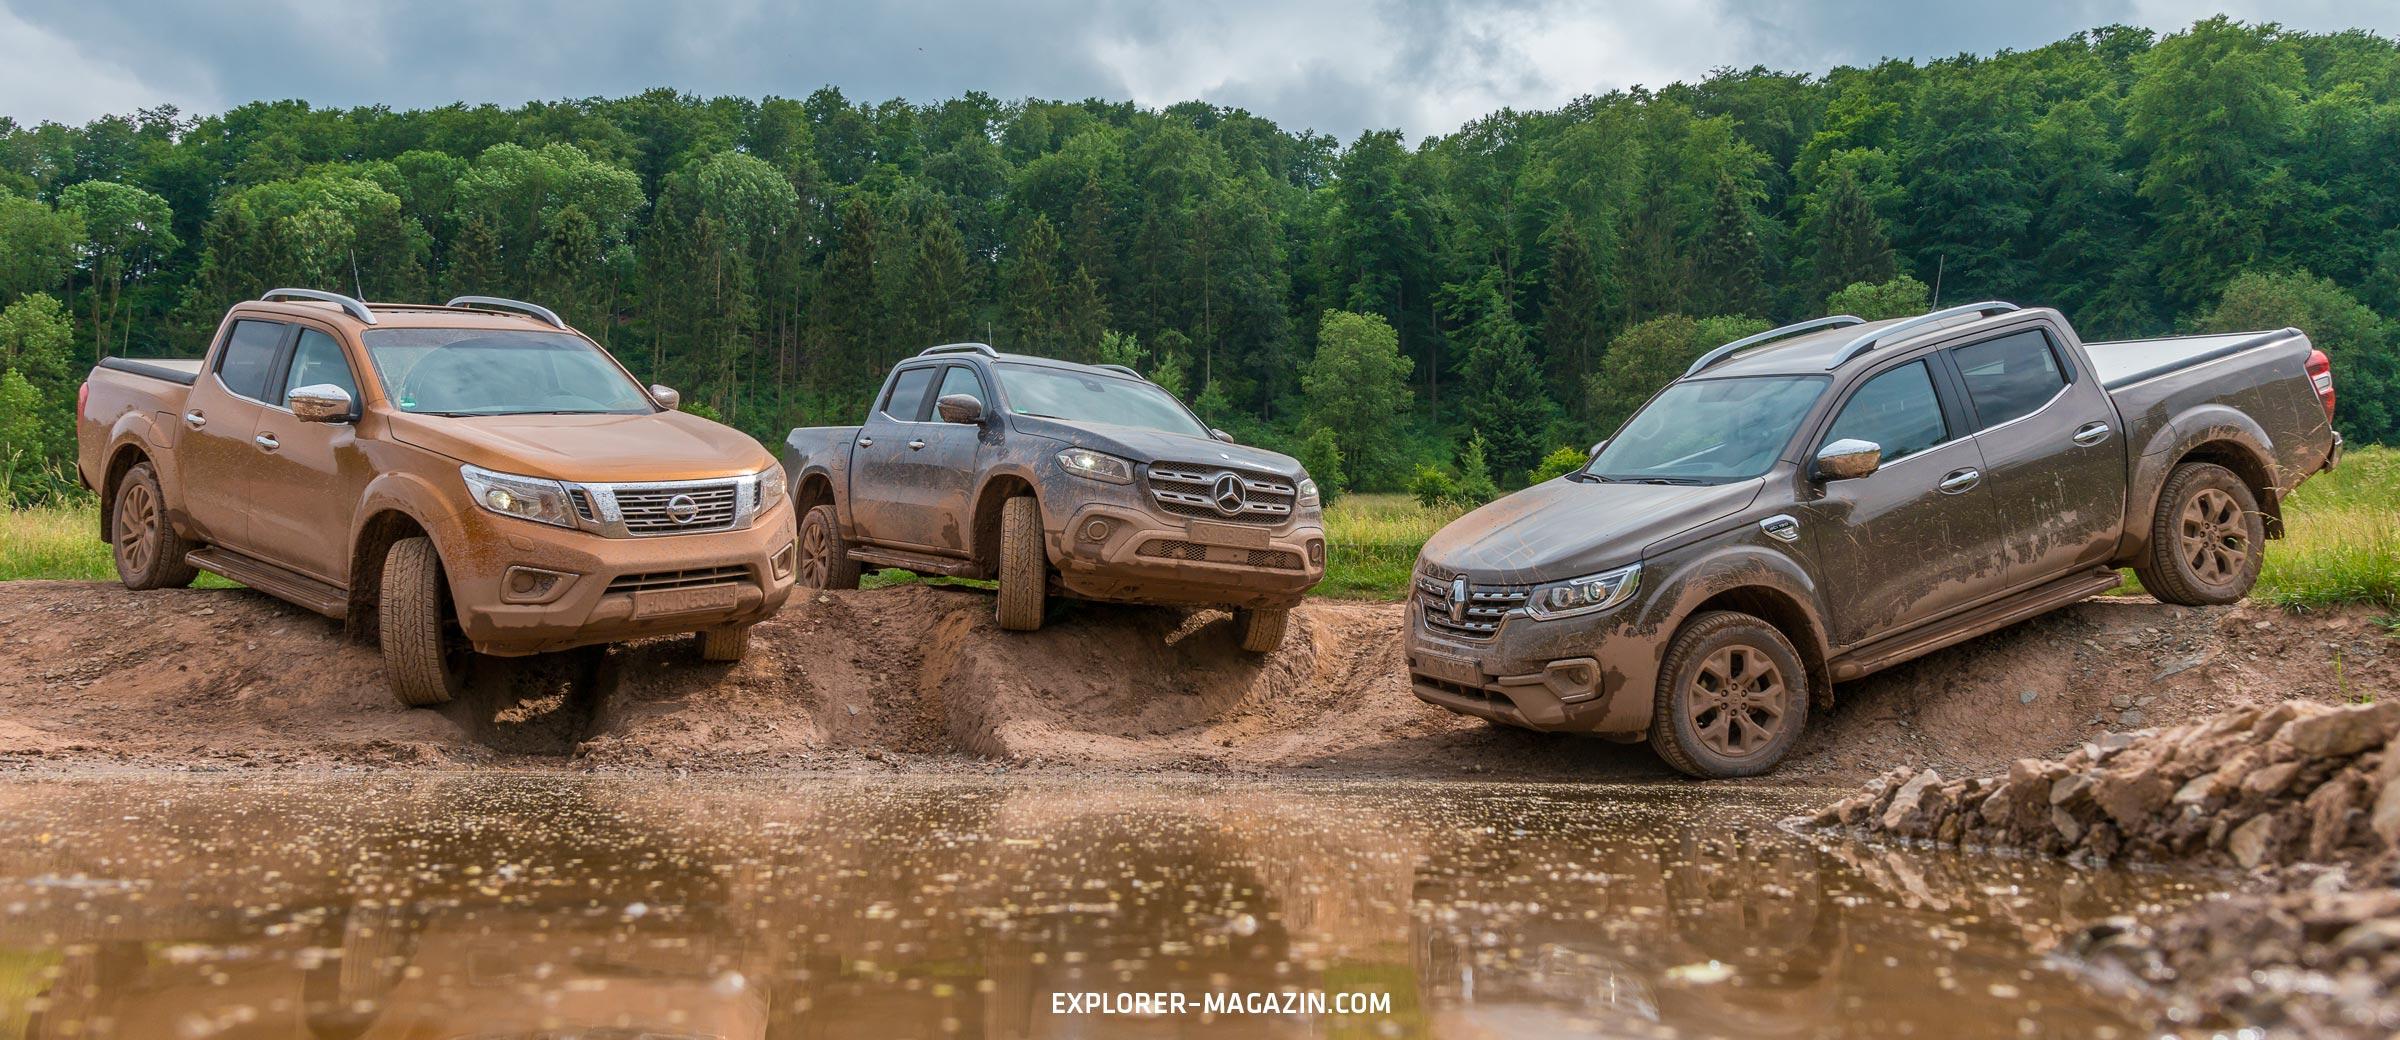 Pickuptest – Nissan Navara gegen Renault Alaskan und Mercedes X-Klasse